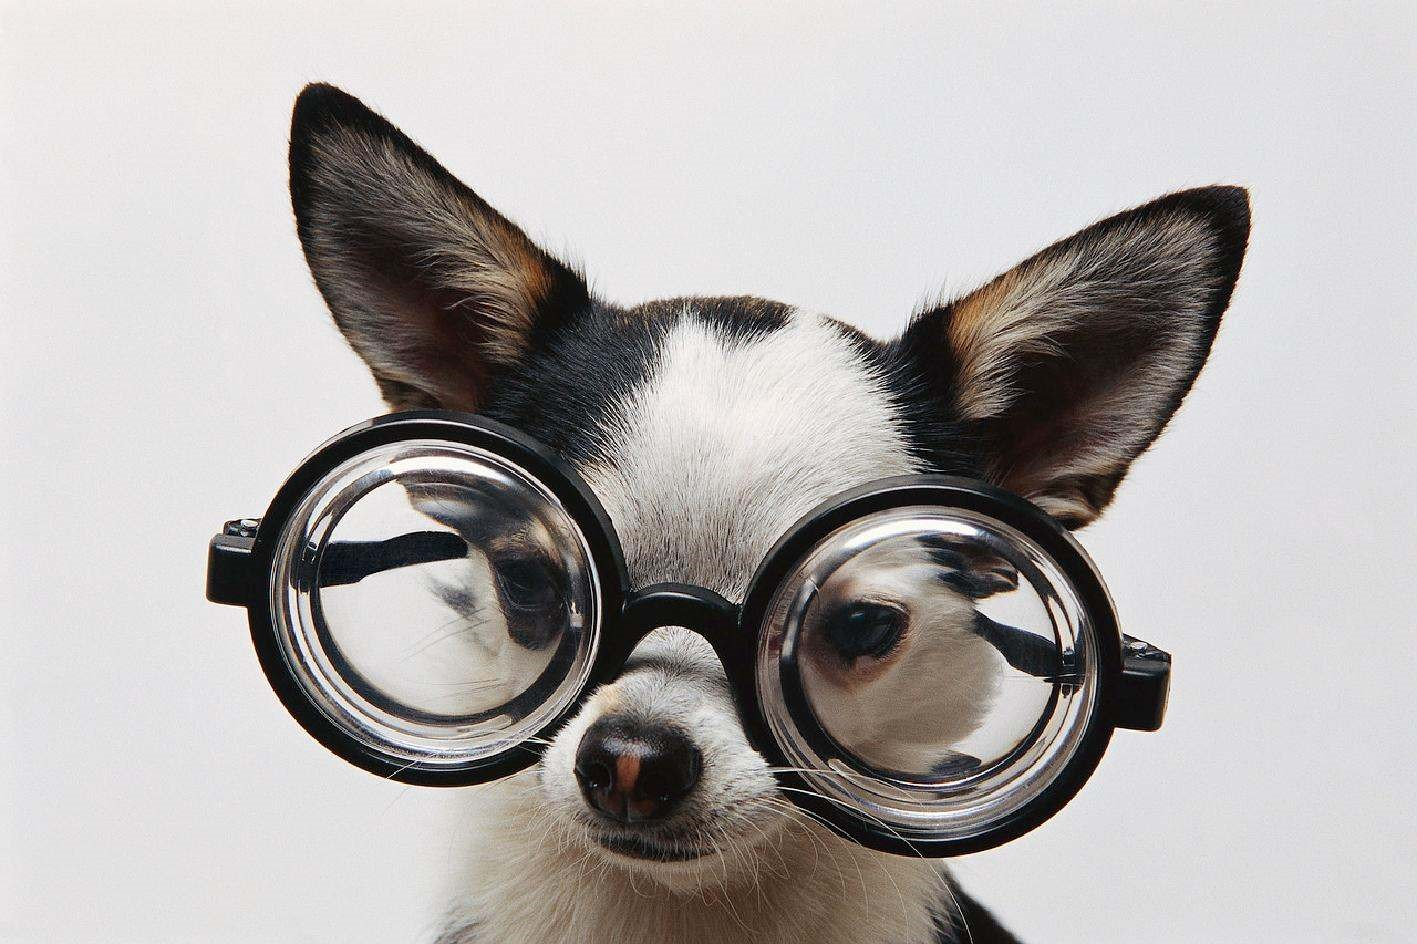 (image source: http://www.dancingdogblog.com/2013/10/fido-google-glass-for-service-dogs-serious-pet-tech/dog-w-glasses/)